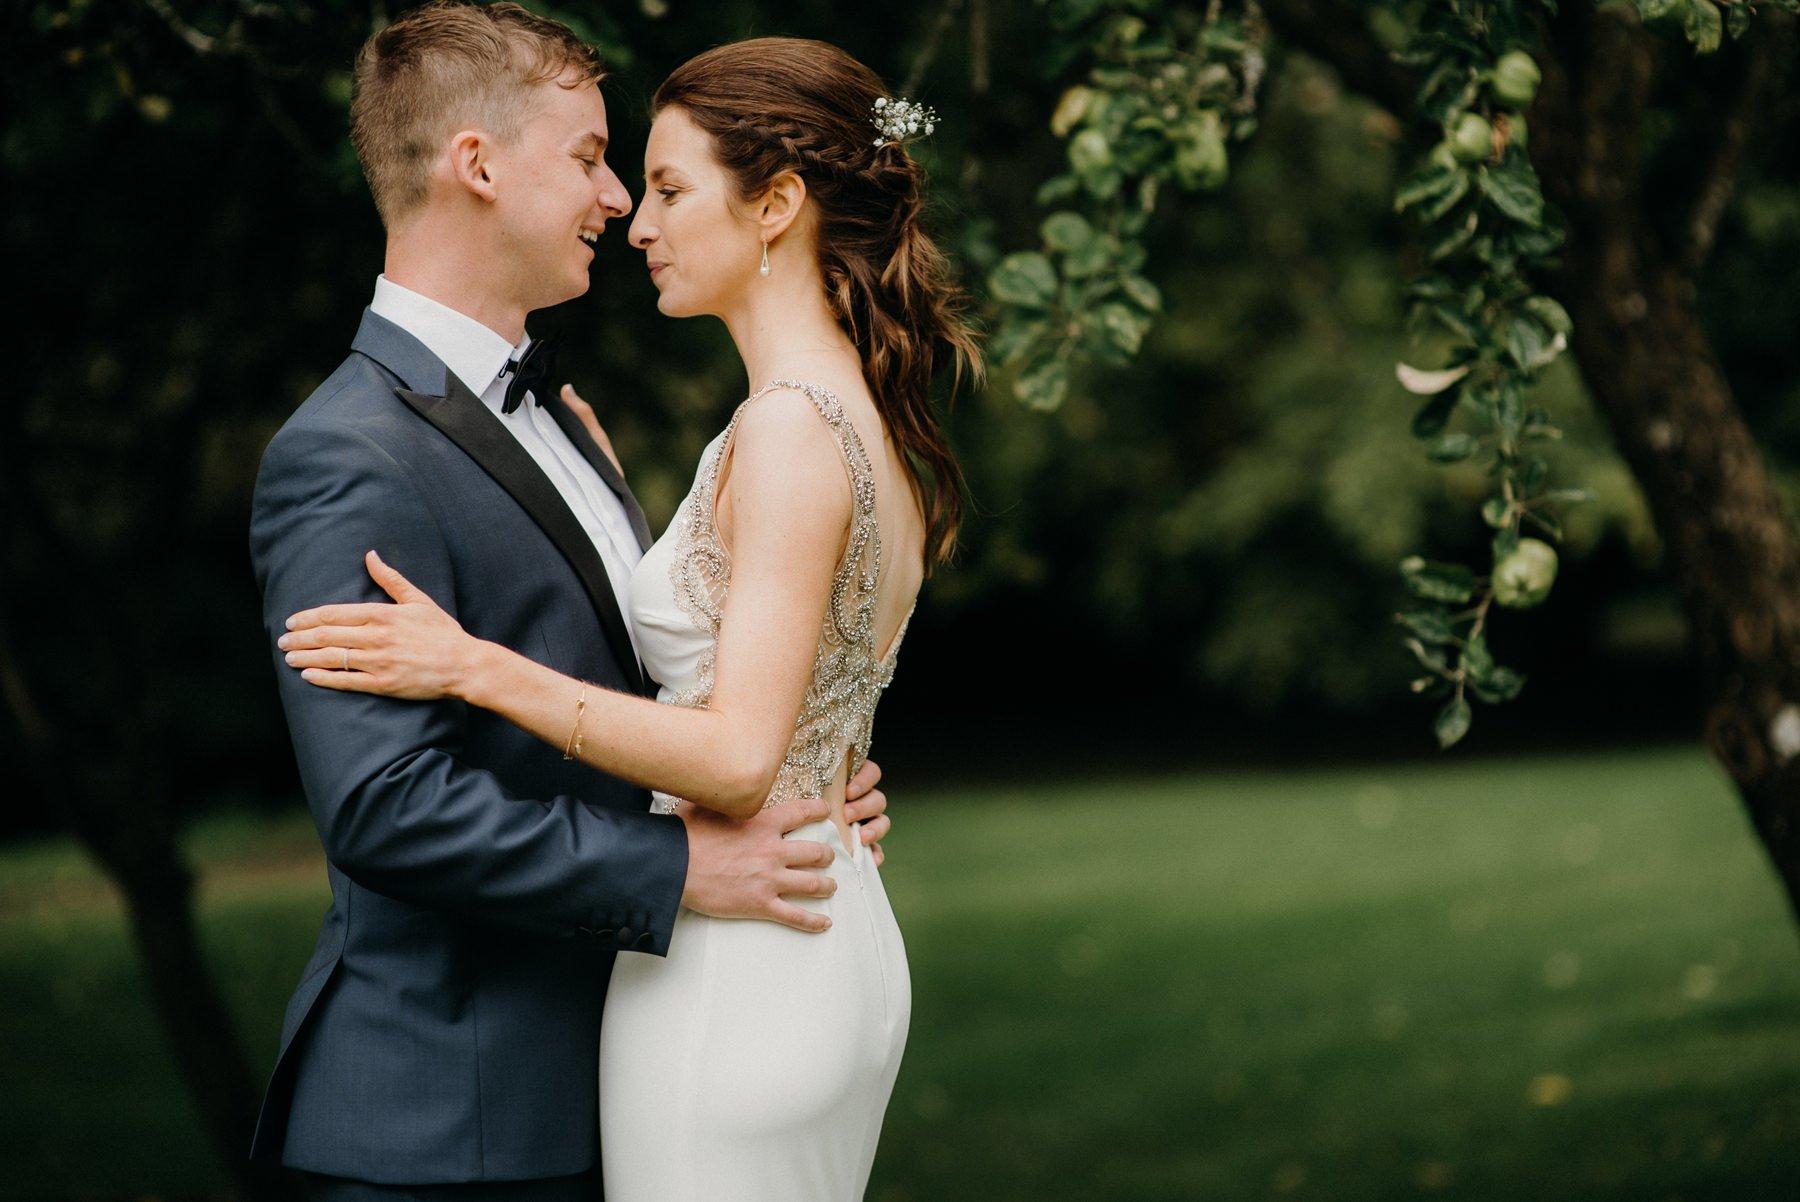 boyna-hill-house-wedding-bride-groom-photography